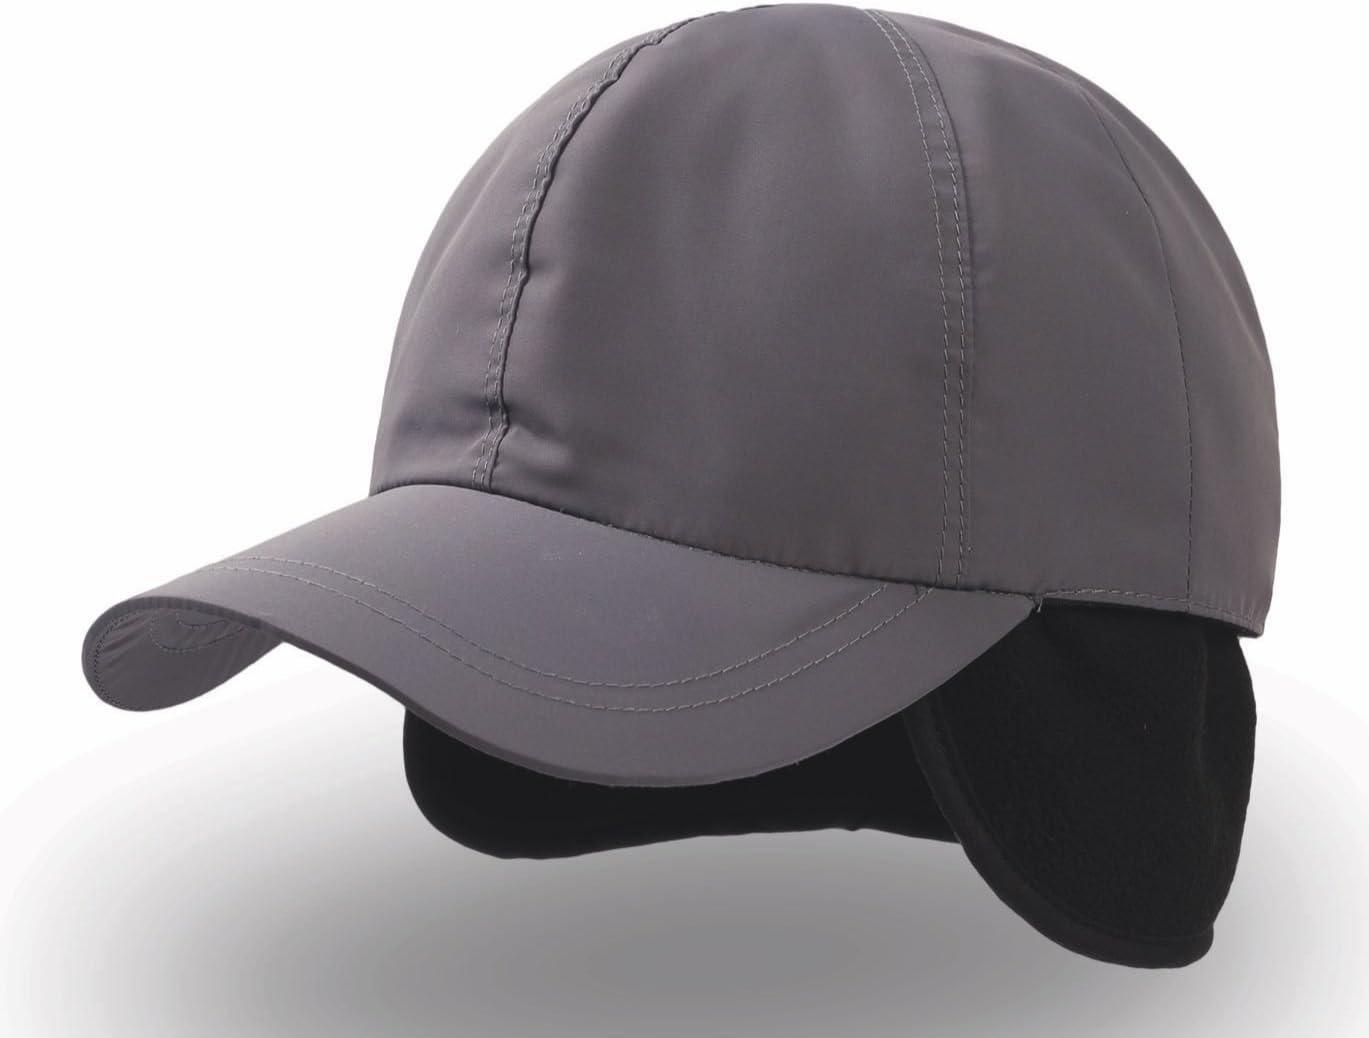 Napapi - Gorra de béisbol impermeable, con orejeras, forrada, gris ...